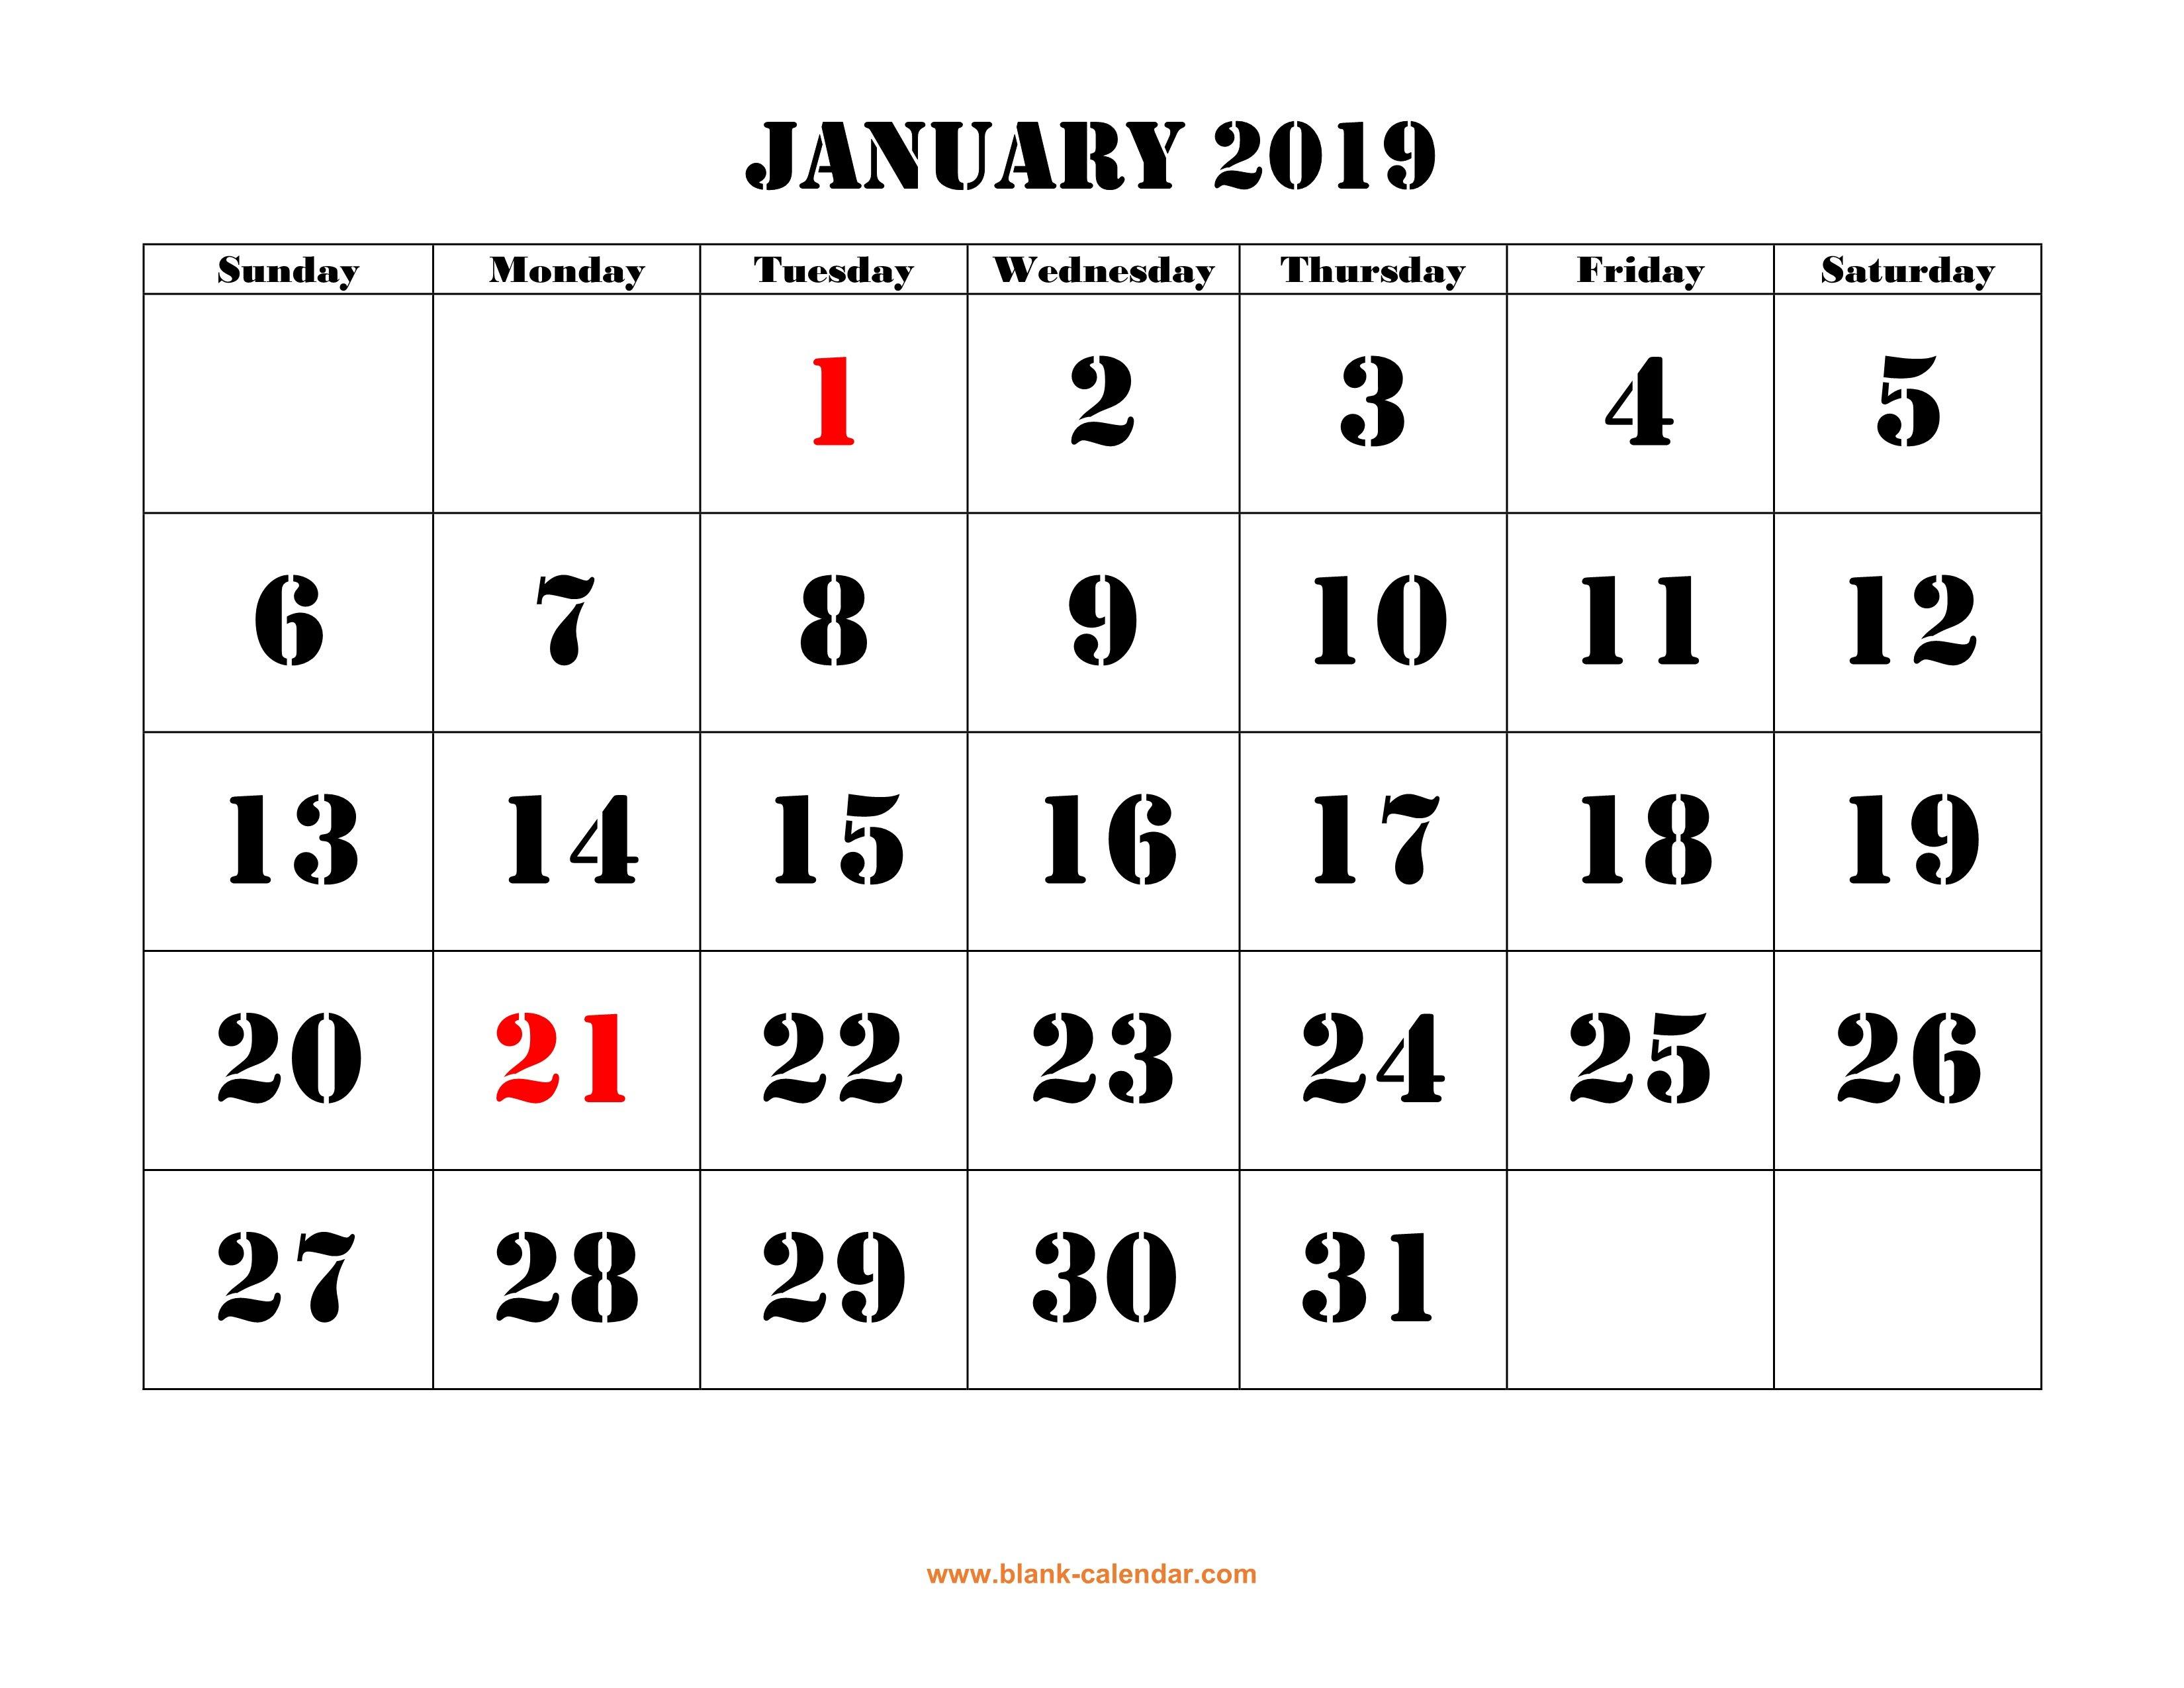 Free Download Printable January 2019 Calendar, Large Font Design Calendar Of 2019 January